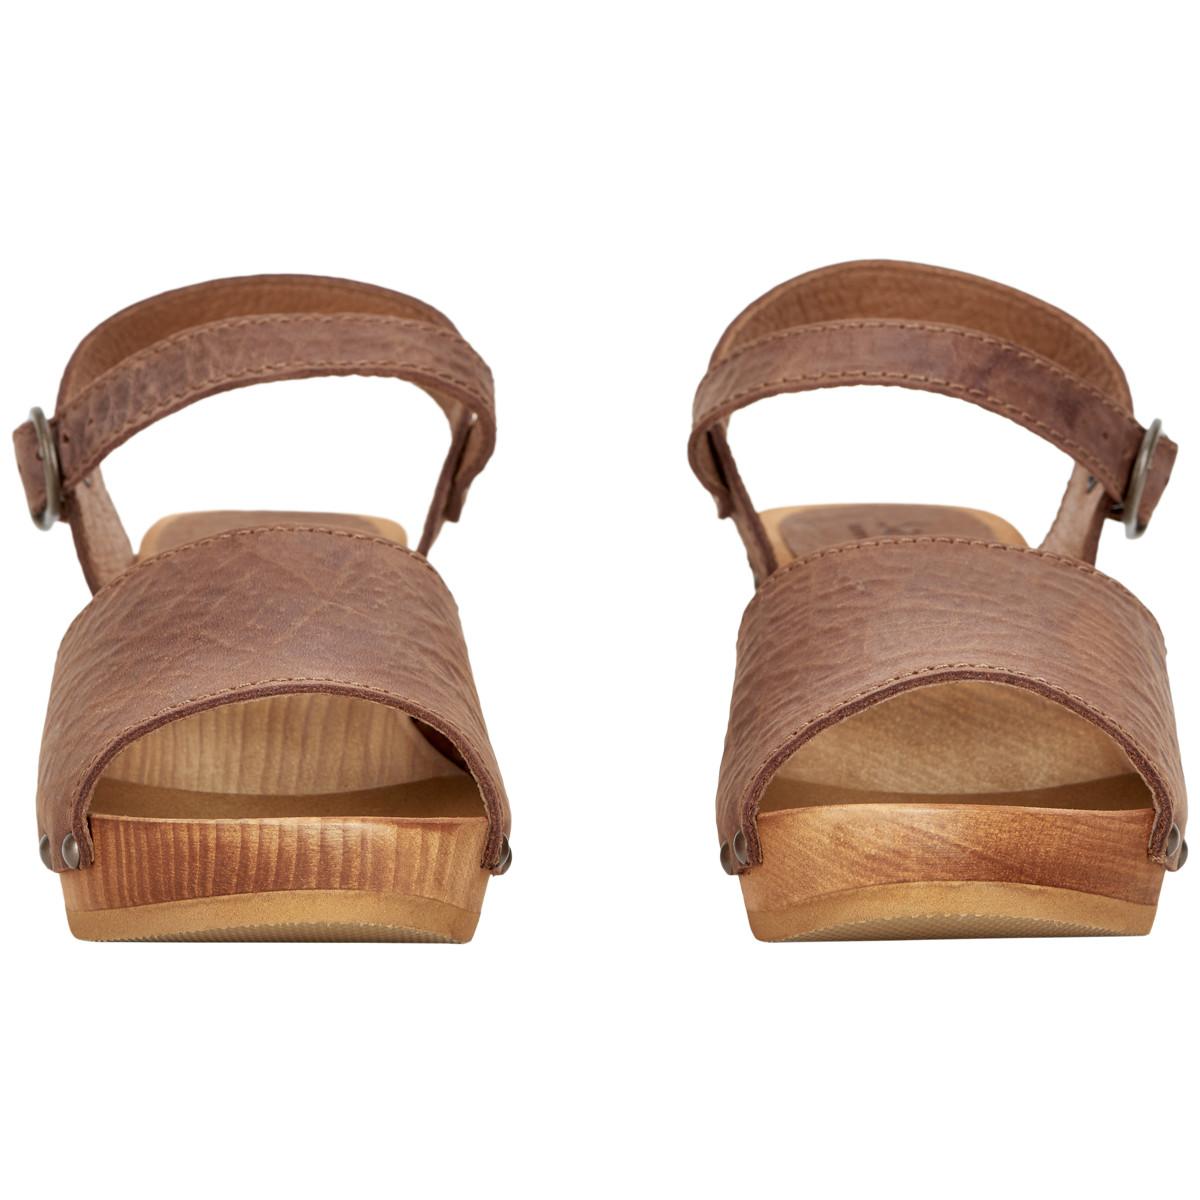 2057412ced74 Sanita Vega Flex Sandal 470607 15 - Sanita